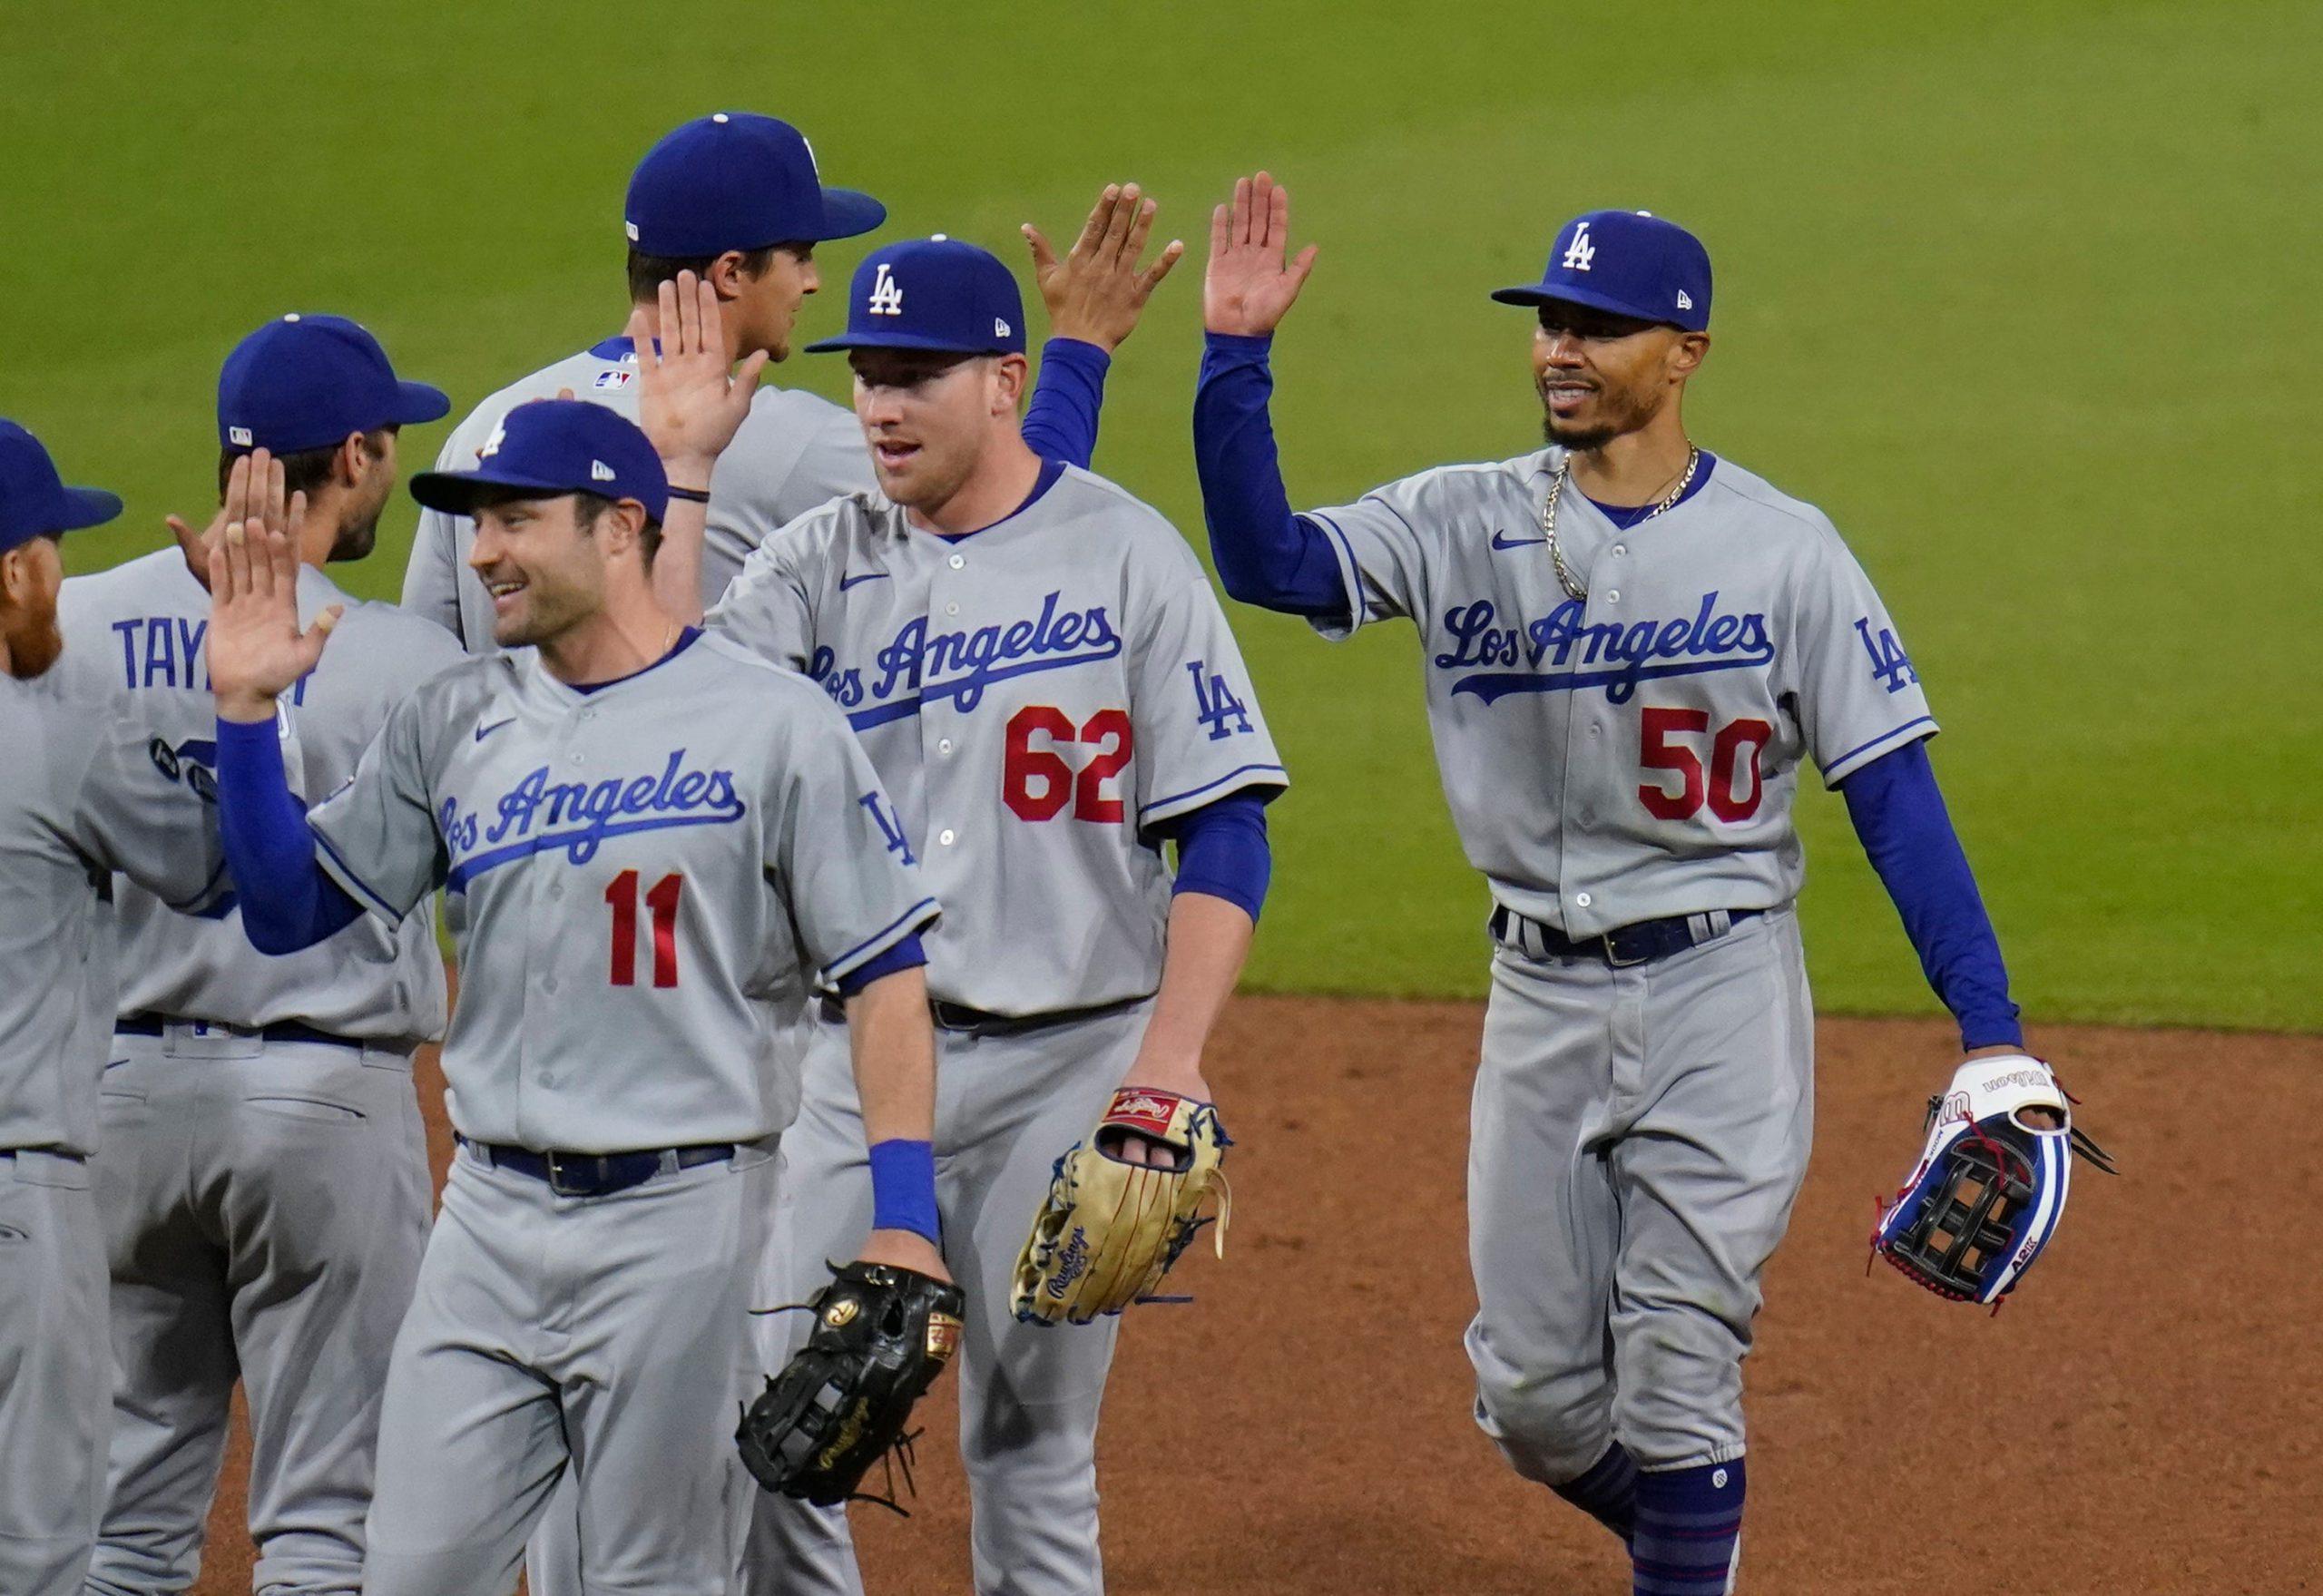 32a5bee8-9e9e-44d4-ab1e-16fbfb3e972c-AP_Dodgers_Padres_Baseball